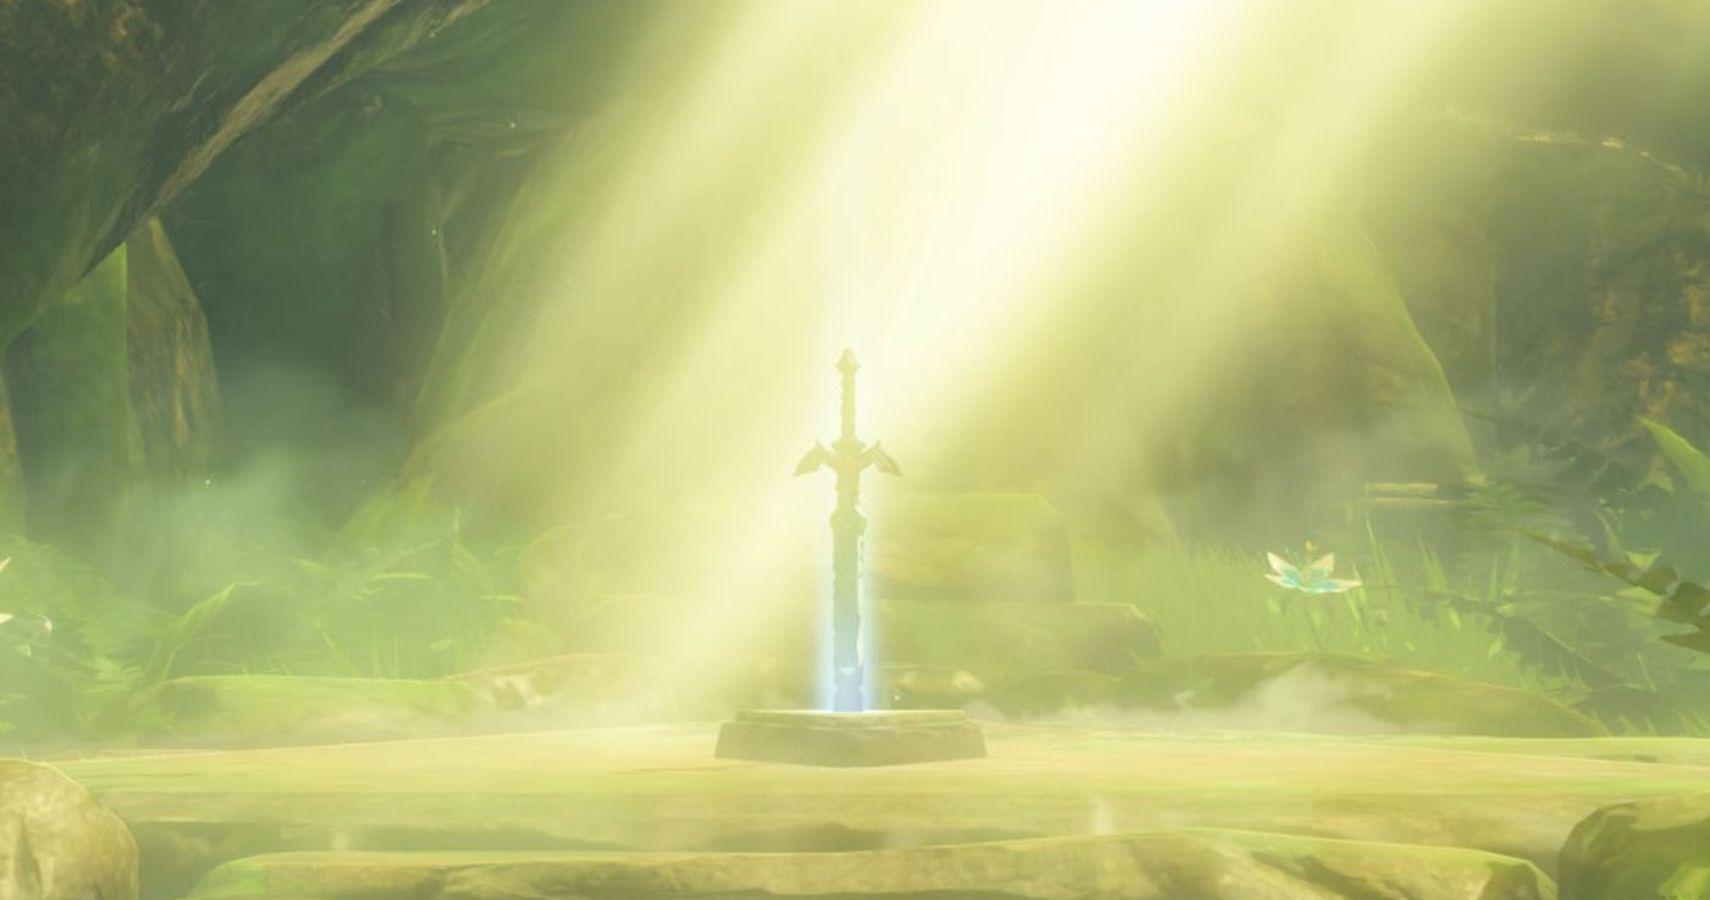 Legend Of Zelda Breath Of The Wild How To Find The Master Sword